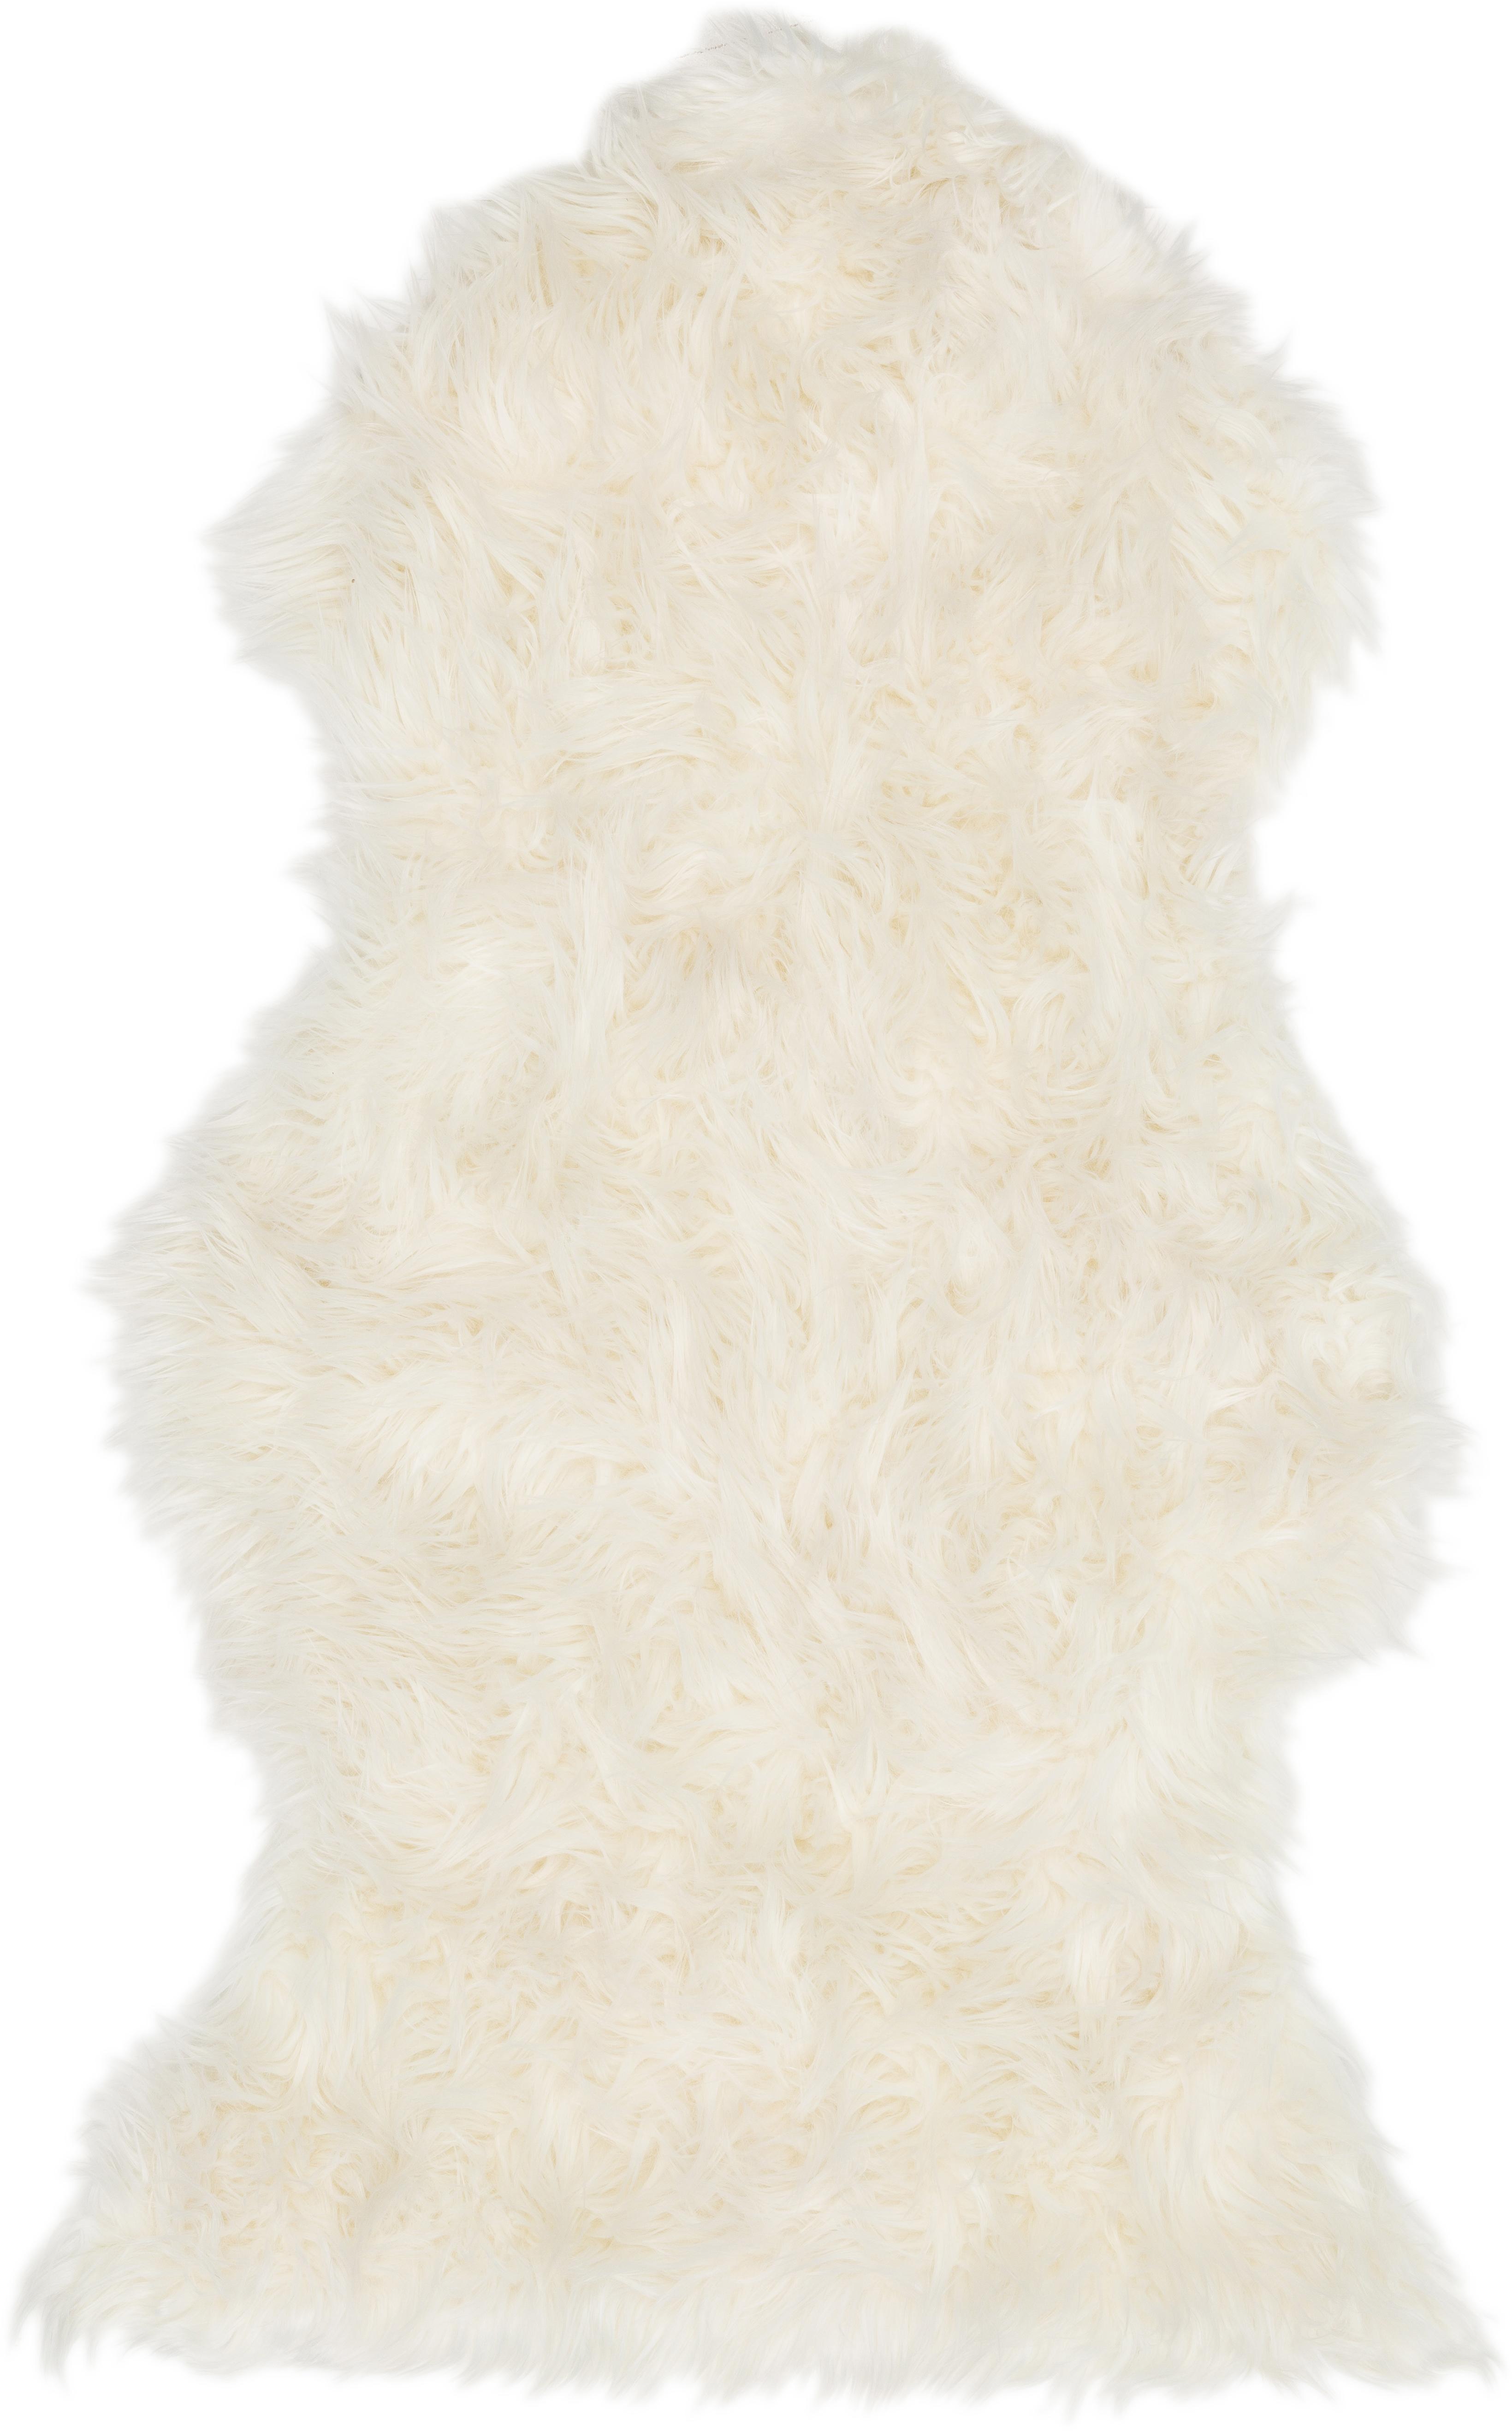 Eco pelle Vancouver, Retro: Poliestere, liscio, Bianco, Larg. 60 x Lung. 100 cm